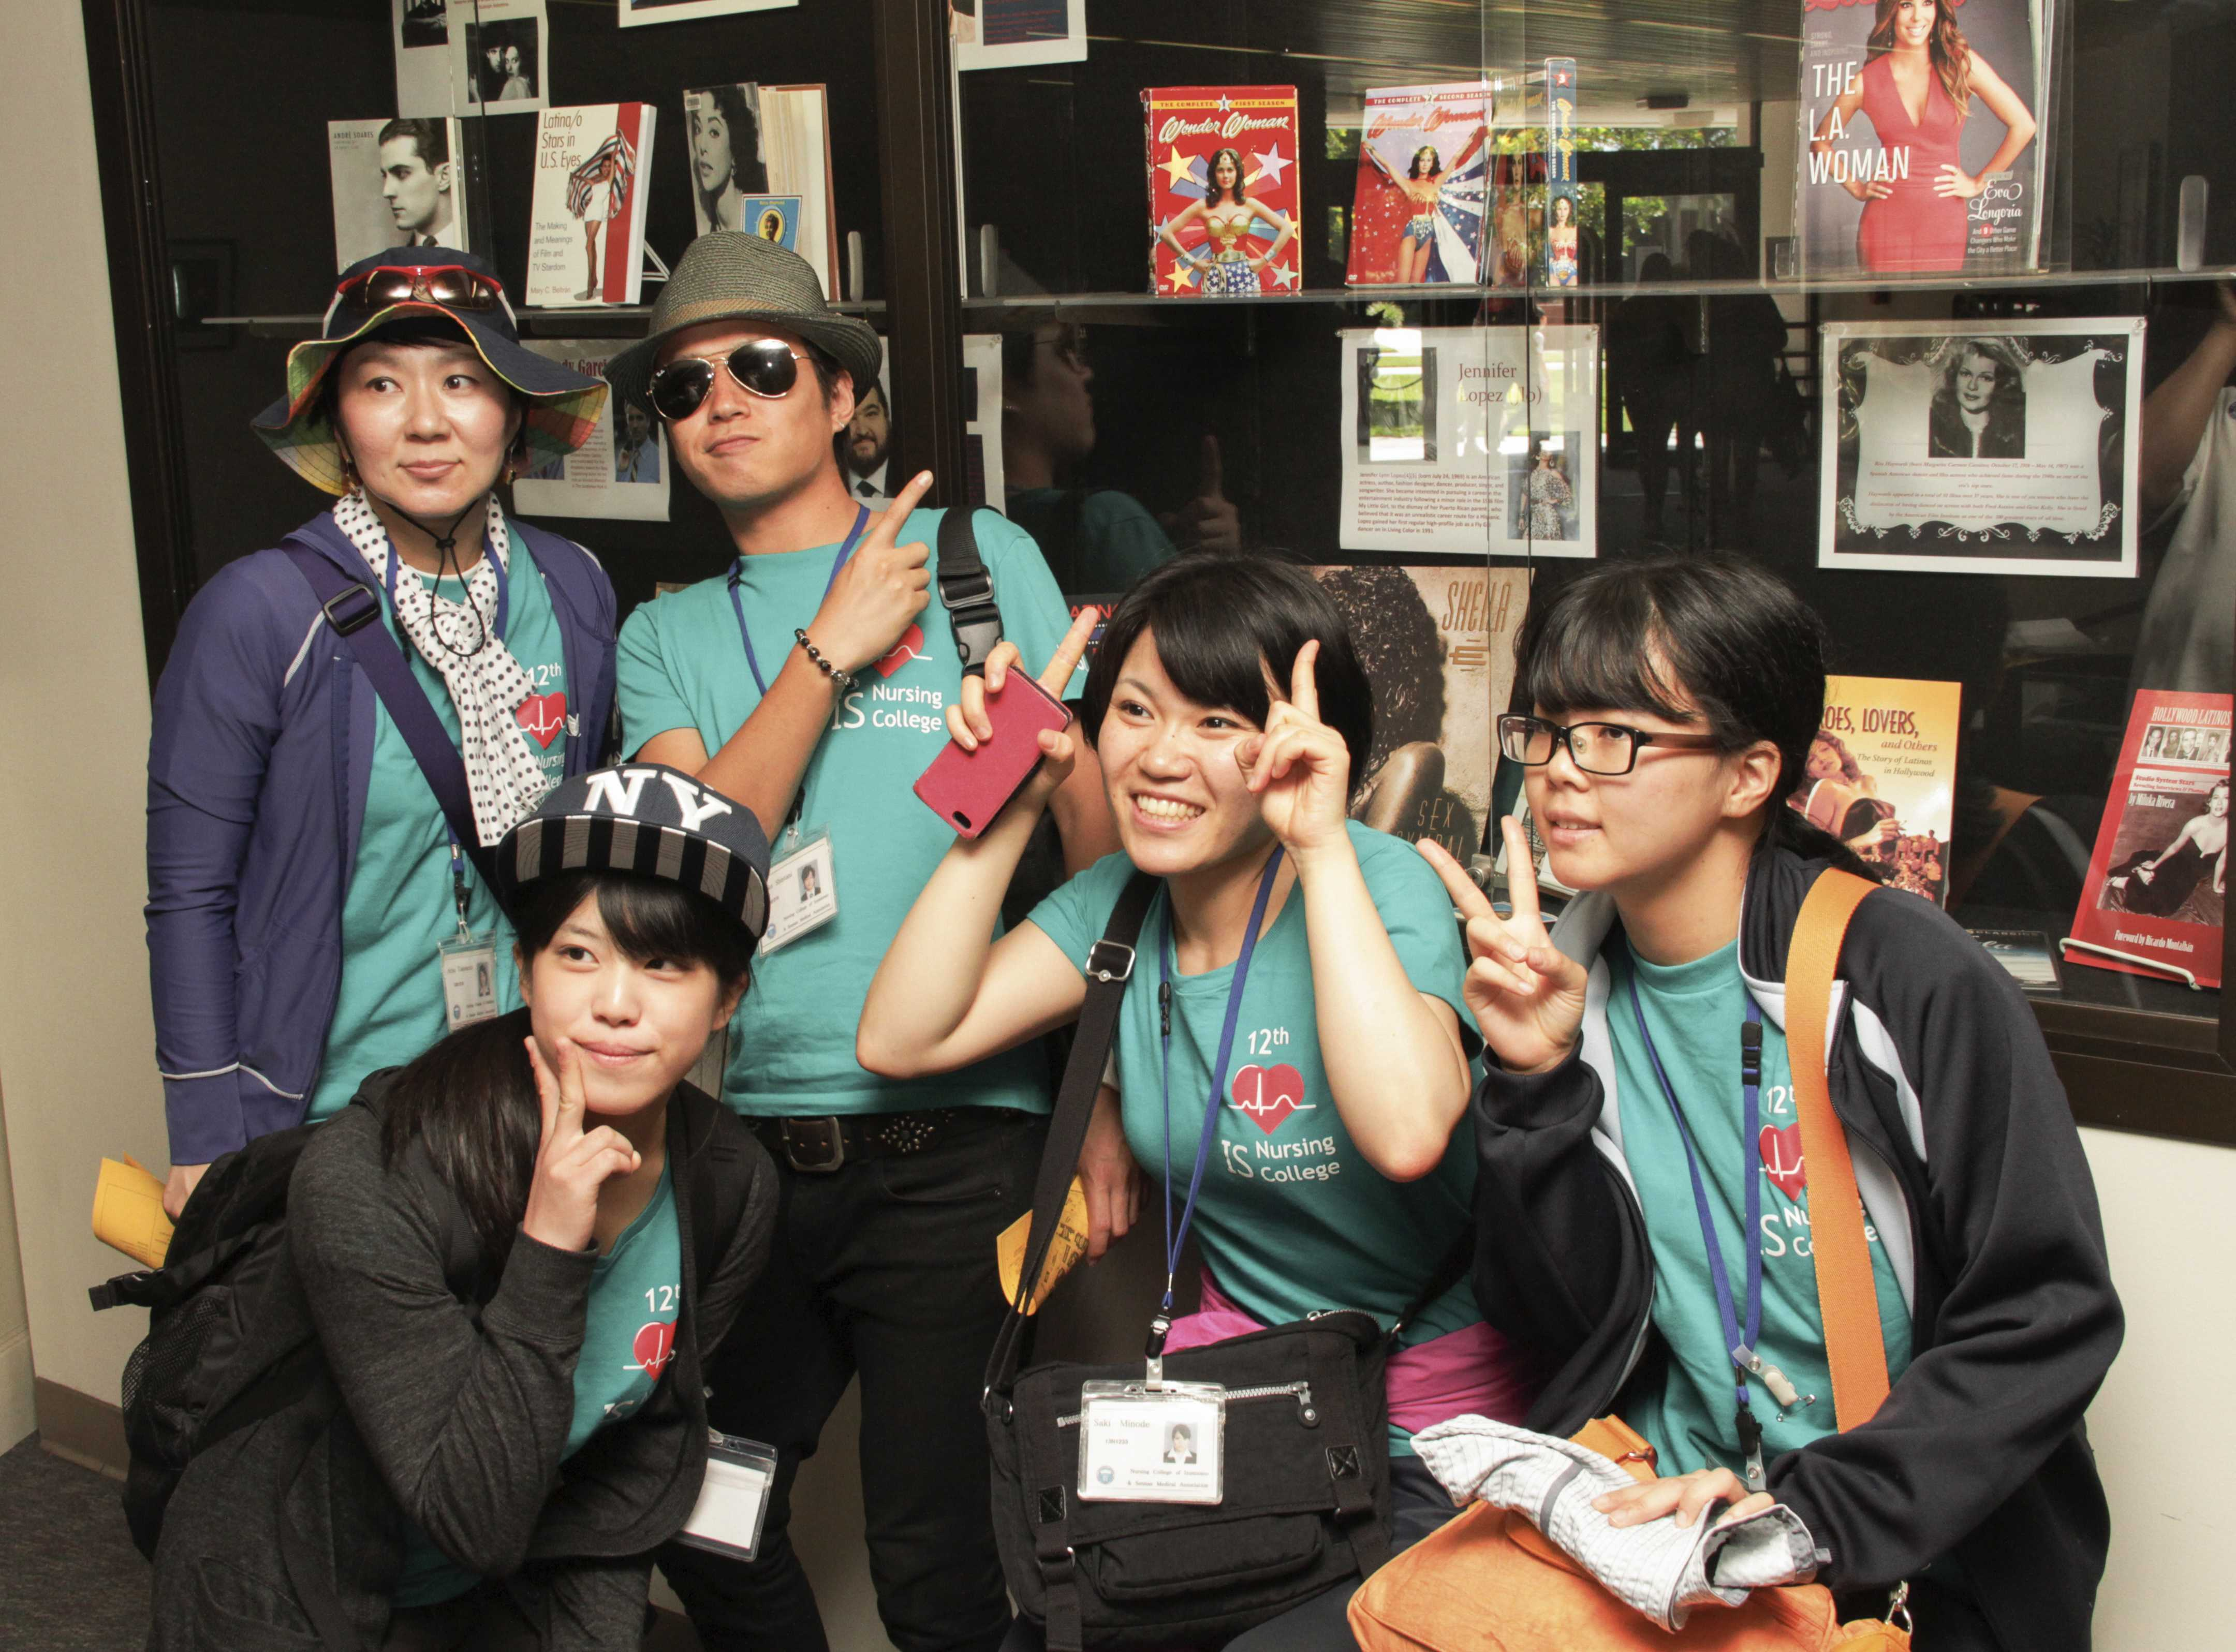 El Camino College Union Japanese Nursing Students